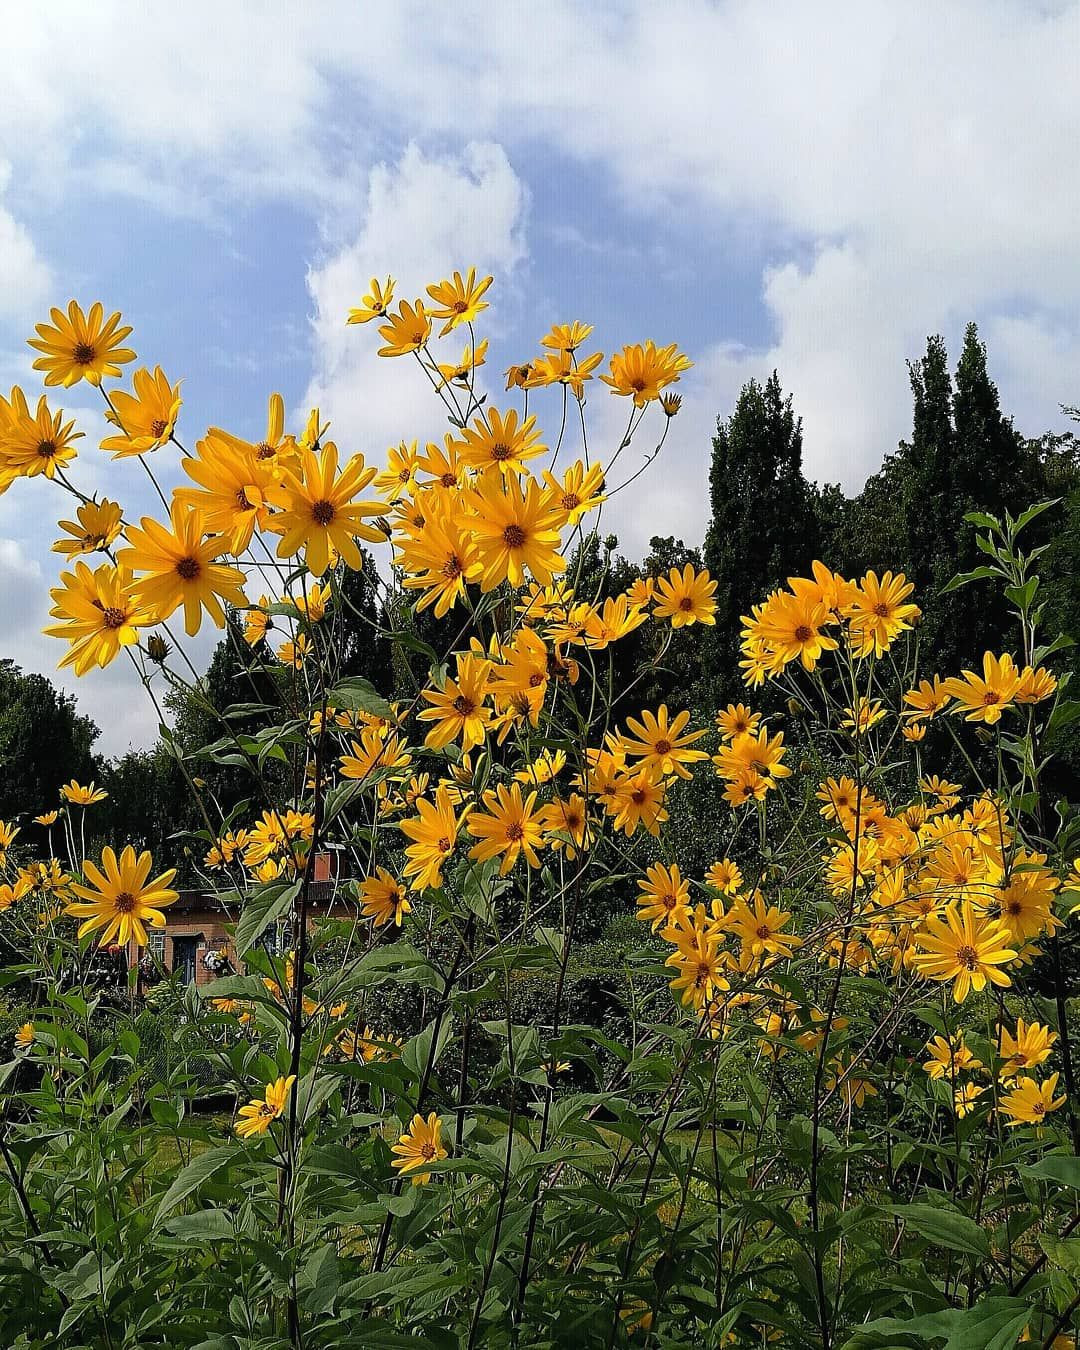 Topinambur Topinambur Blutenmontag Garten Knollen Kleingarten Blumenbild Photography Blumenfotografie Garten Blumen Fotografie Blumenbilder